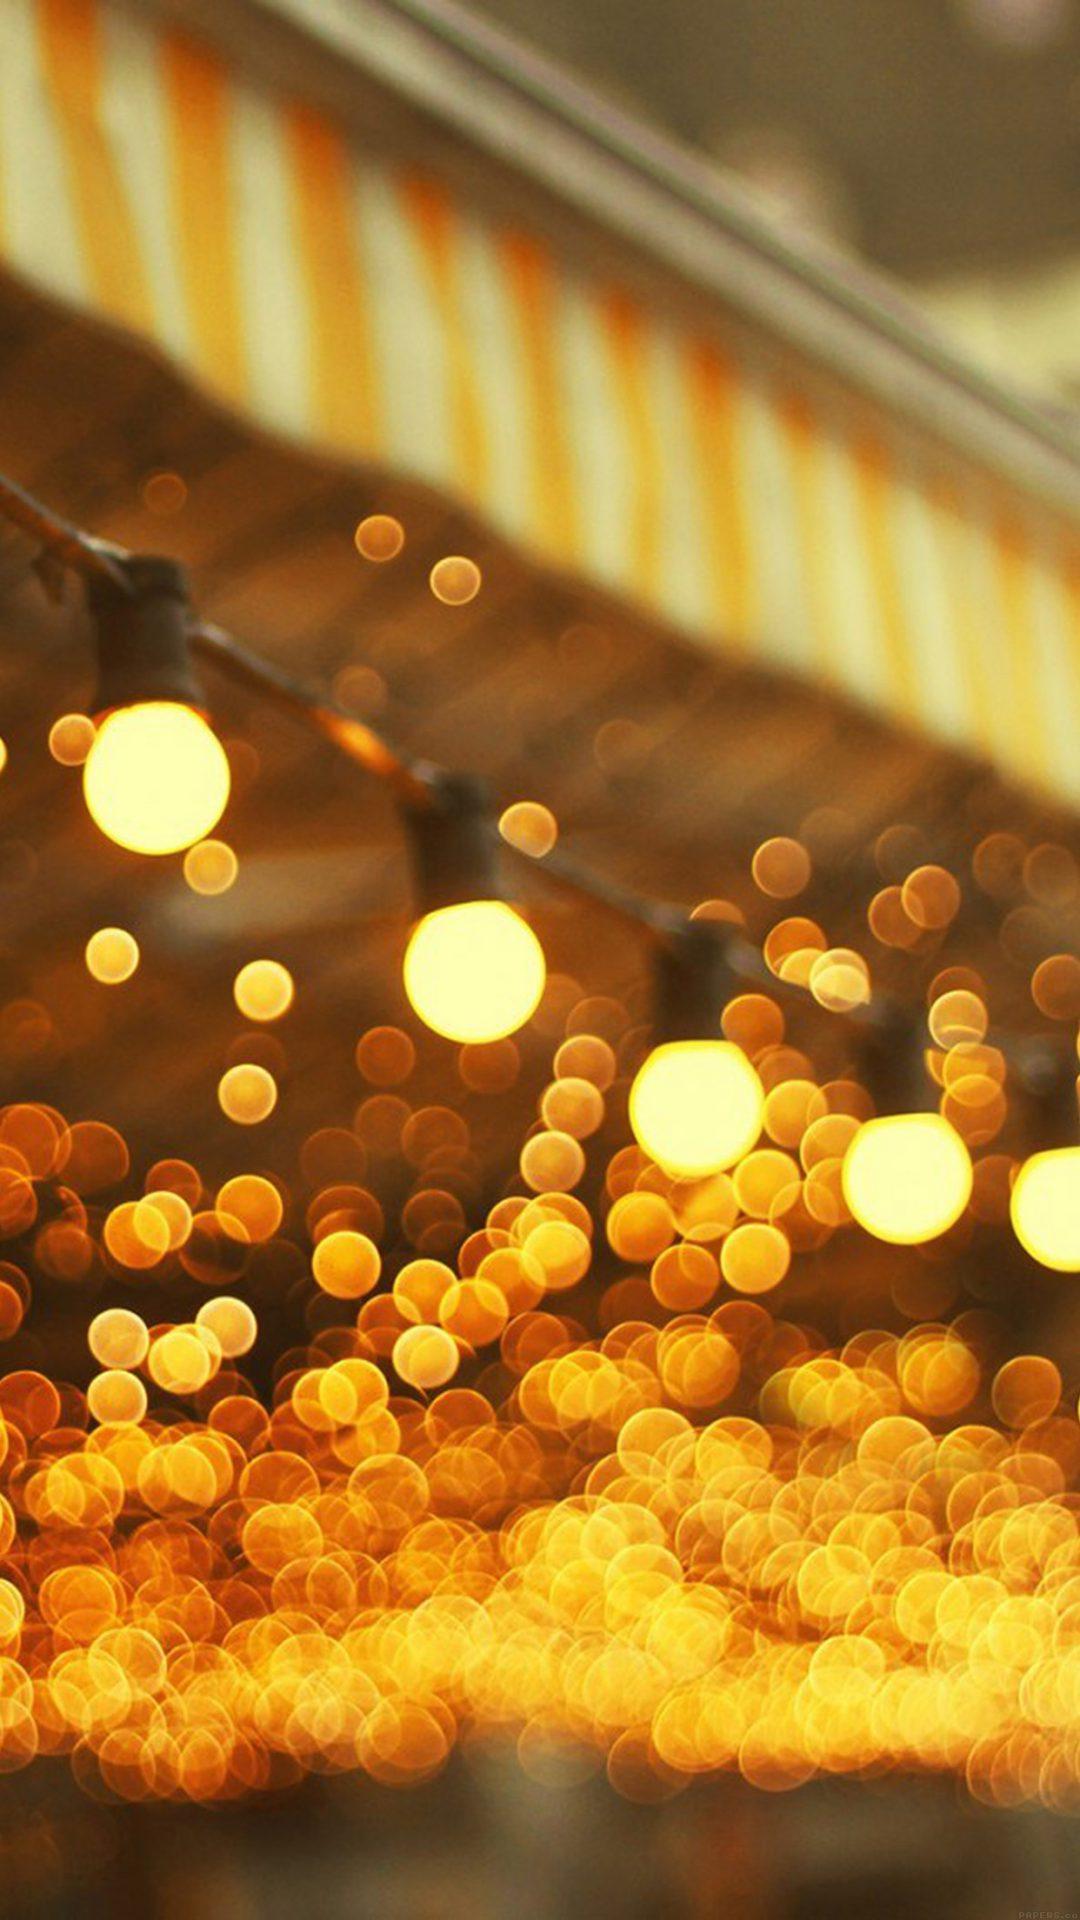 City Light Bulbs Romantic Street